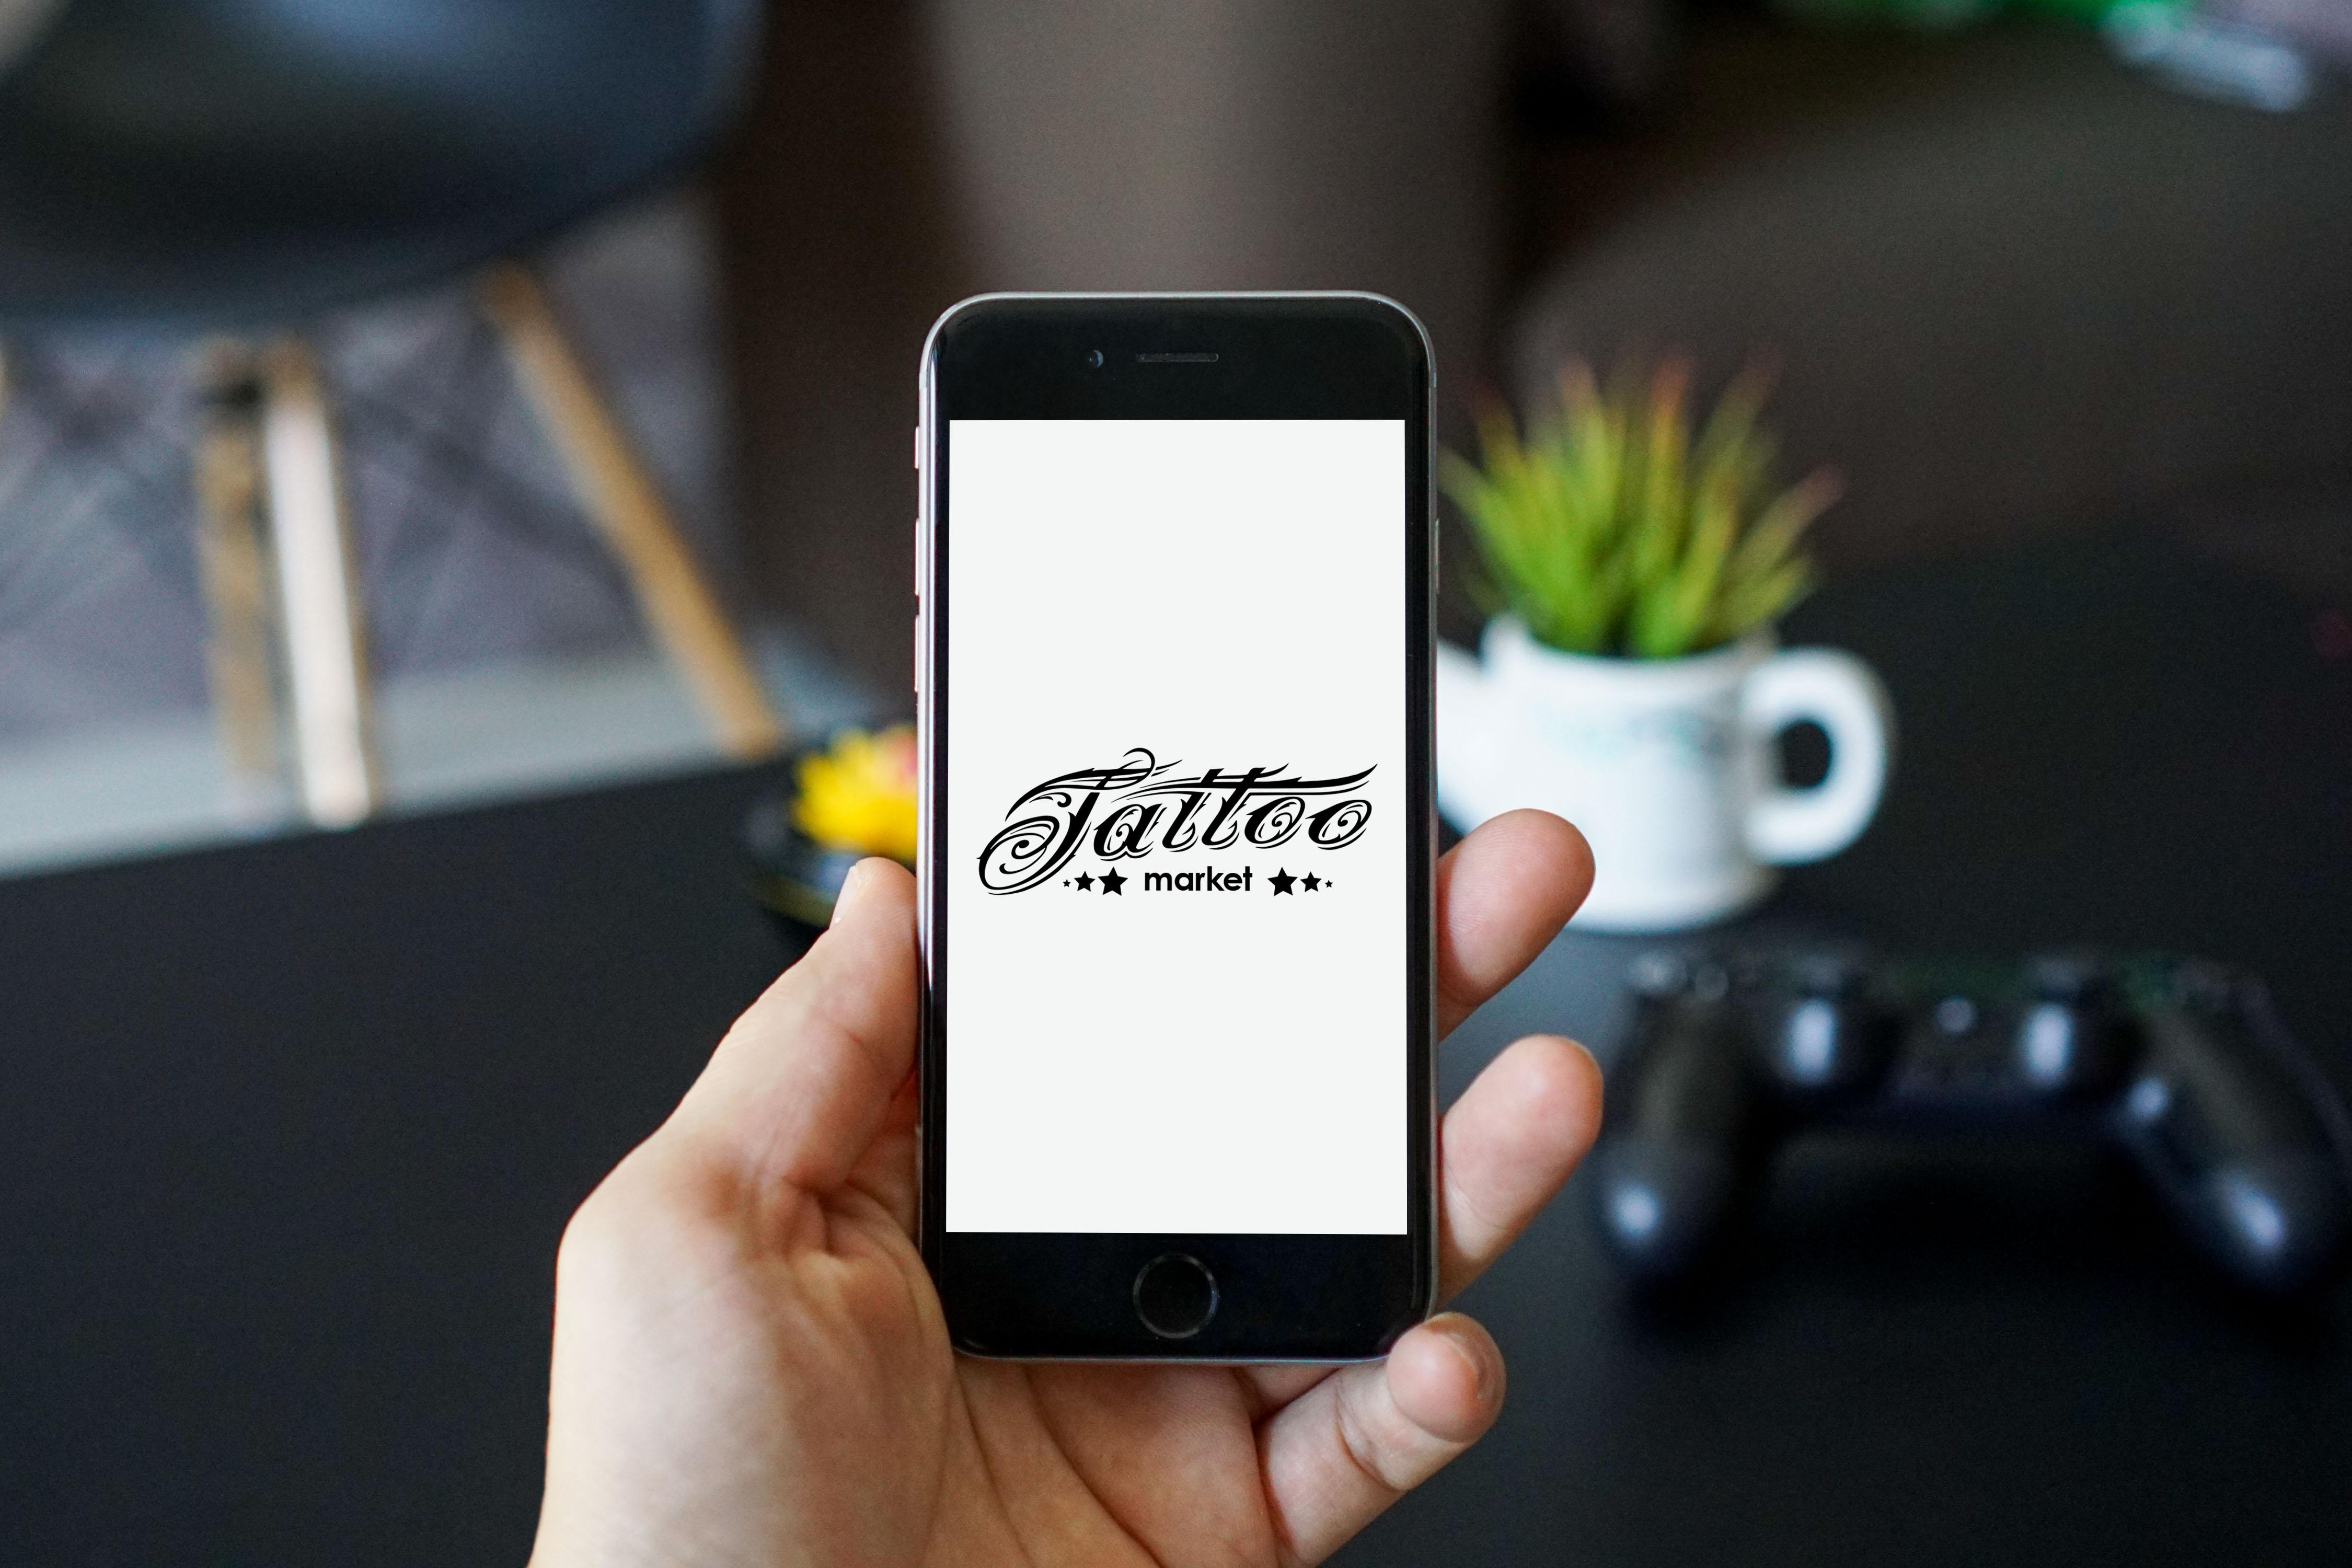 Редизайн логотипа магазина тату оборудования TattooMarket.ru фото f_9665c3b7b5a1ab3e.jpg